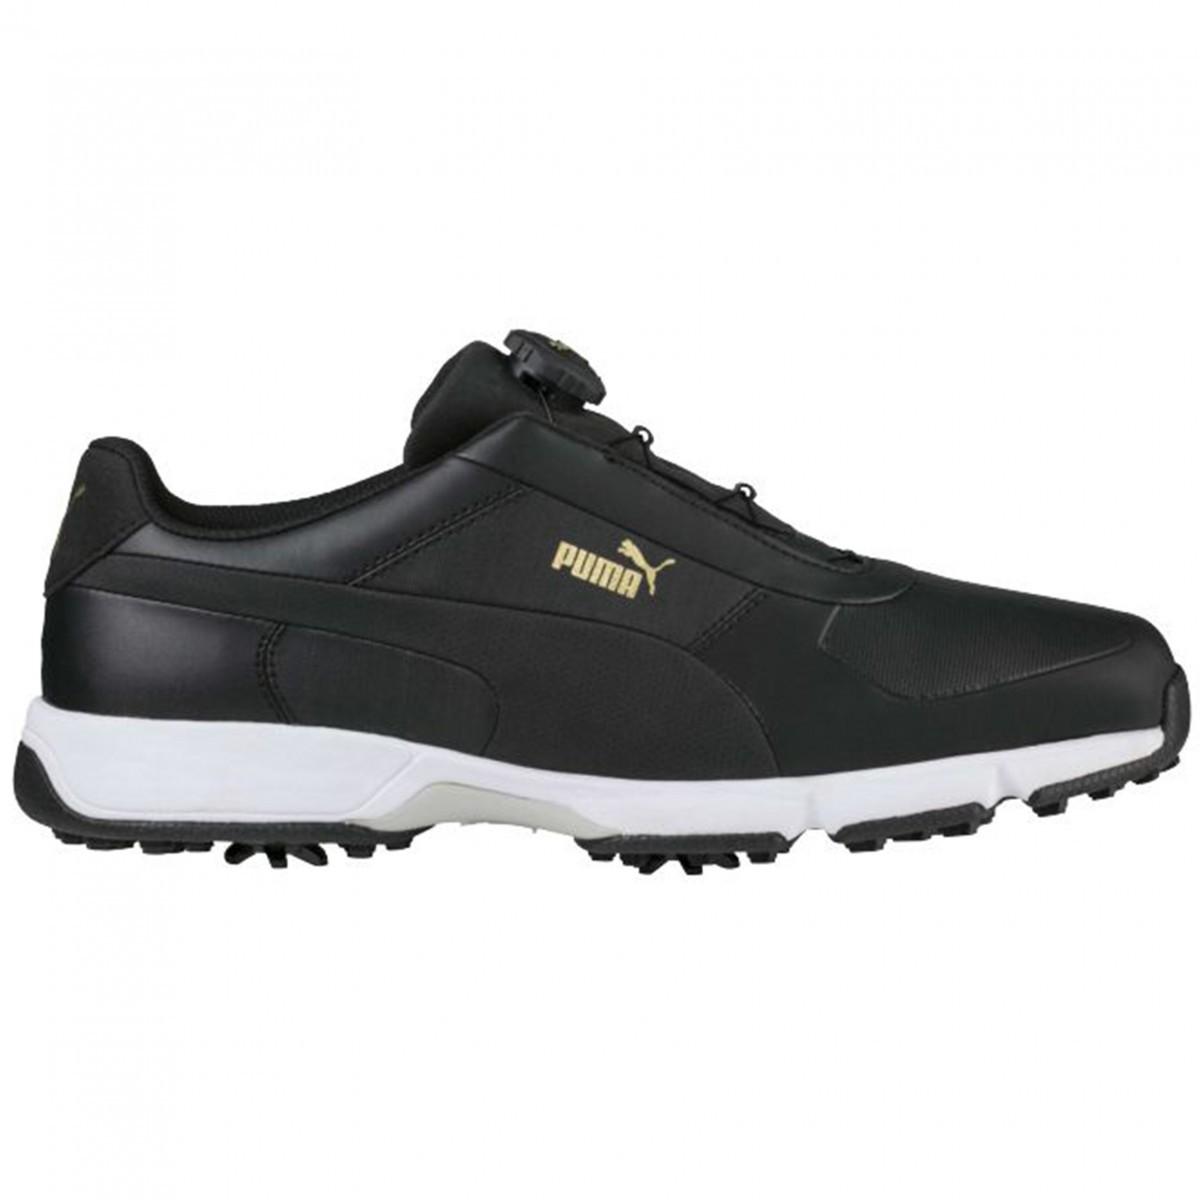 Puma Golf Mens Ignite Drive Disc Waterproof Golf Shoes f6df81af8